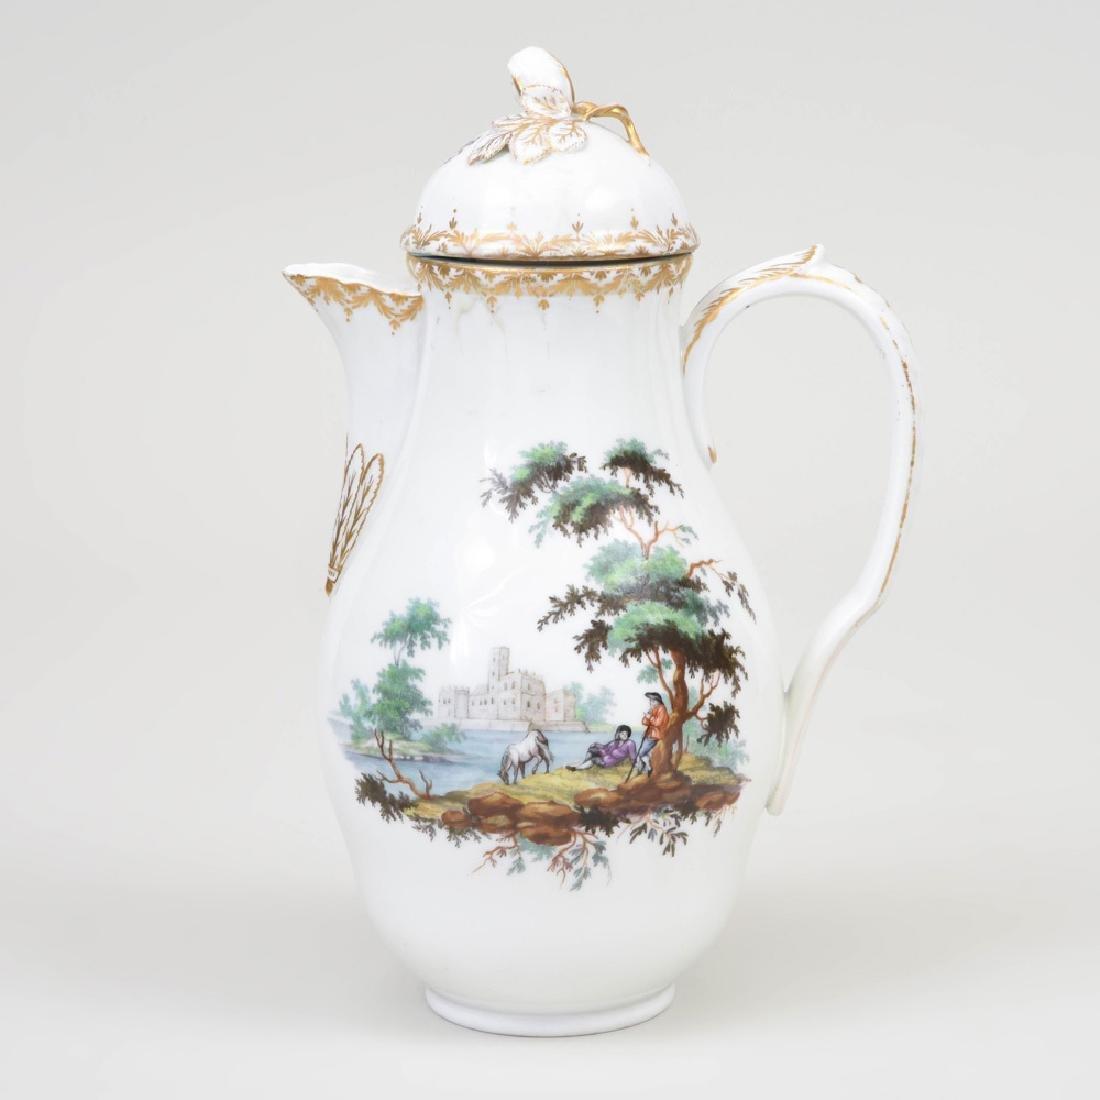 Royal Copenhagen Porcelain Coffee Pot and Cover - 2